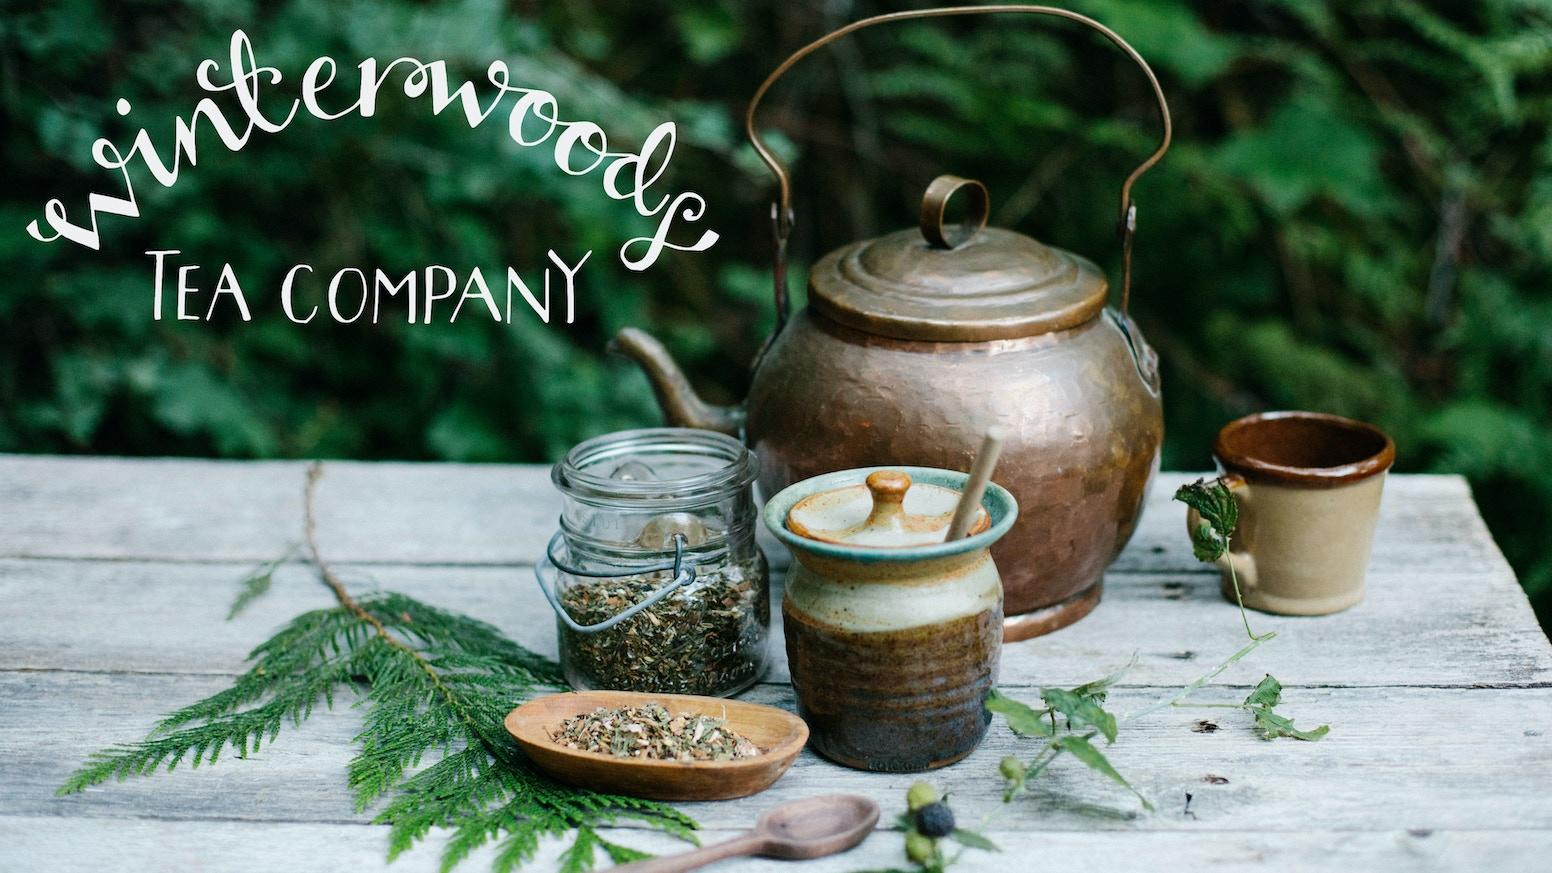 Blend gourmet herbal tea - Winterwoods Tea Company Pacific Northwest Tea Blends